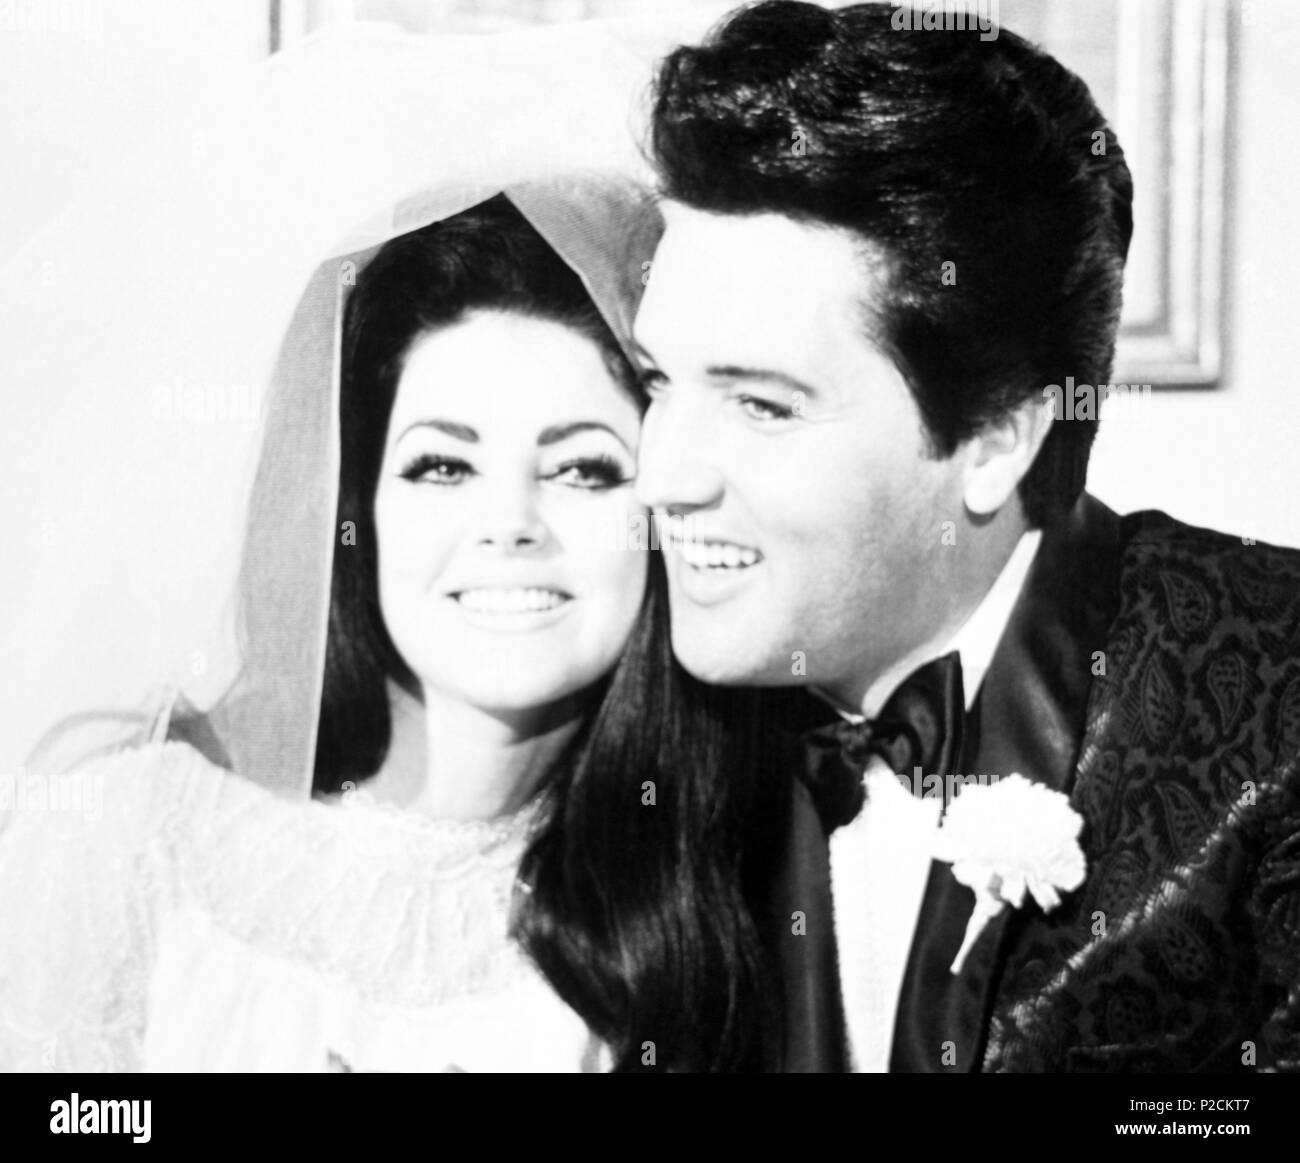 The American singer Elvis Presley at his wedding with Priscilla Presley in 1967. - Stock Image